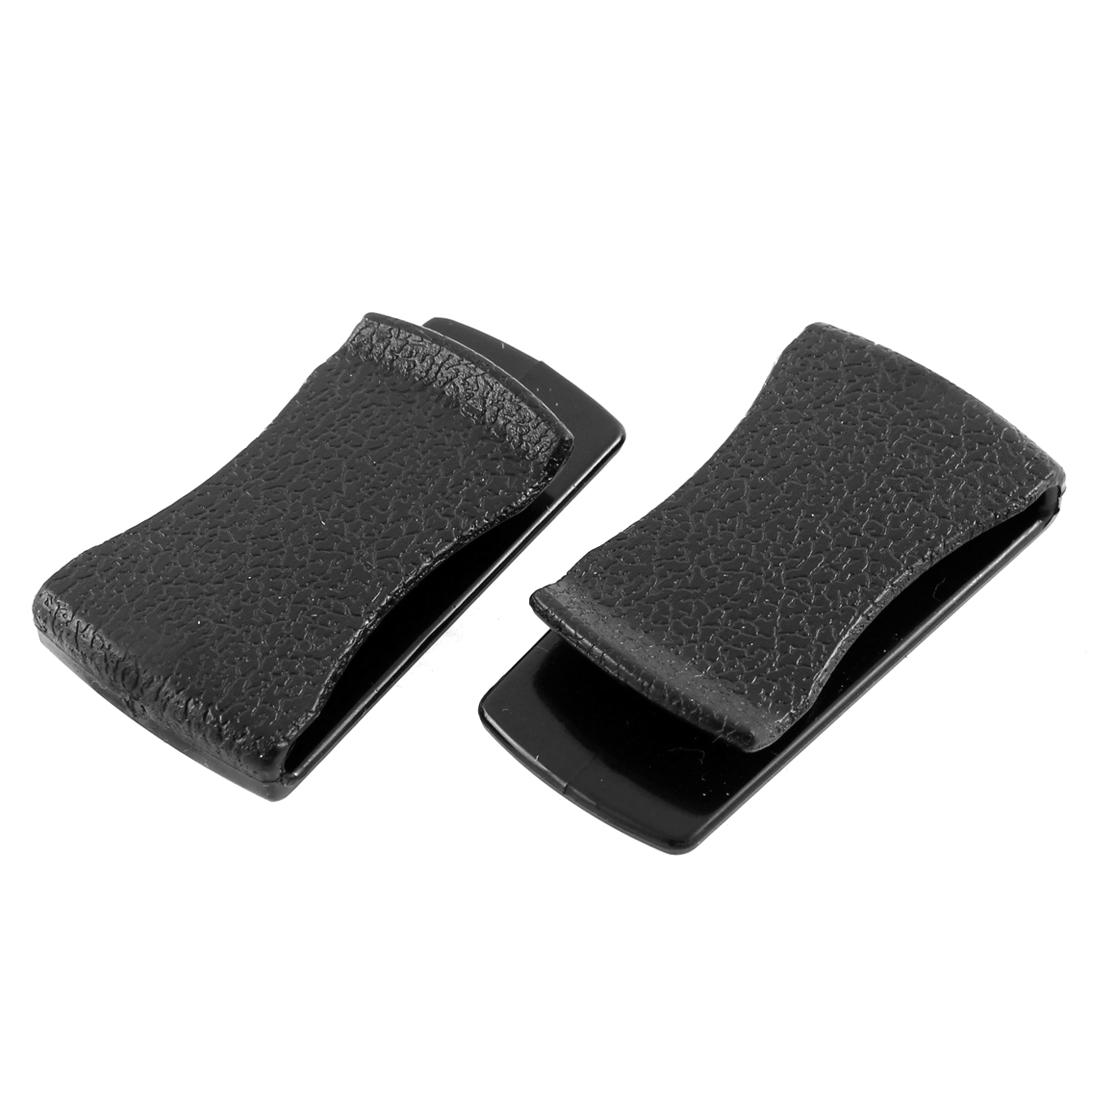 Multifunctional Self Adhesive Car Hook Bill Clip Card Glasses Holder Black 2PCS